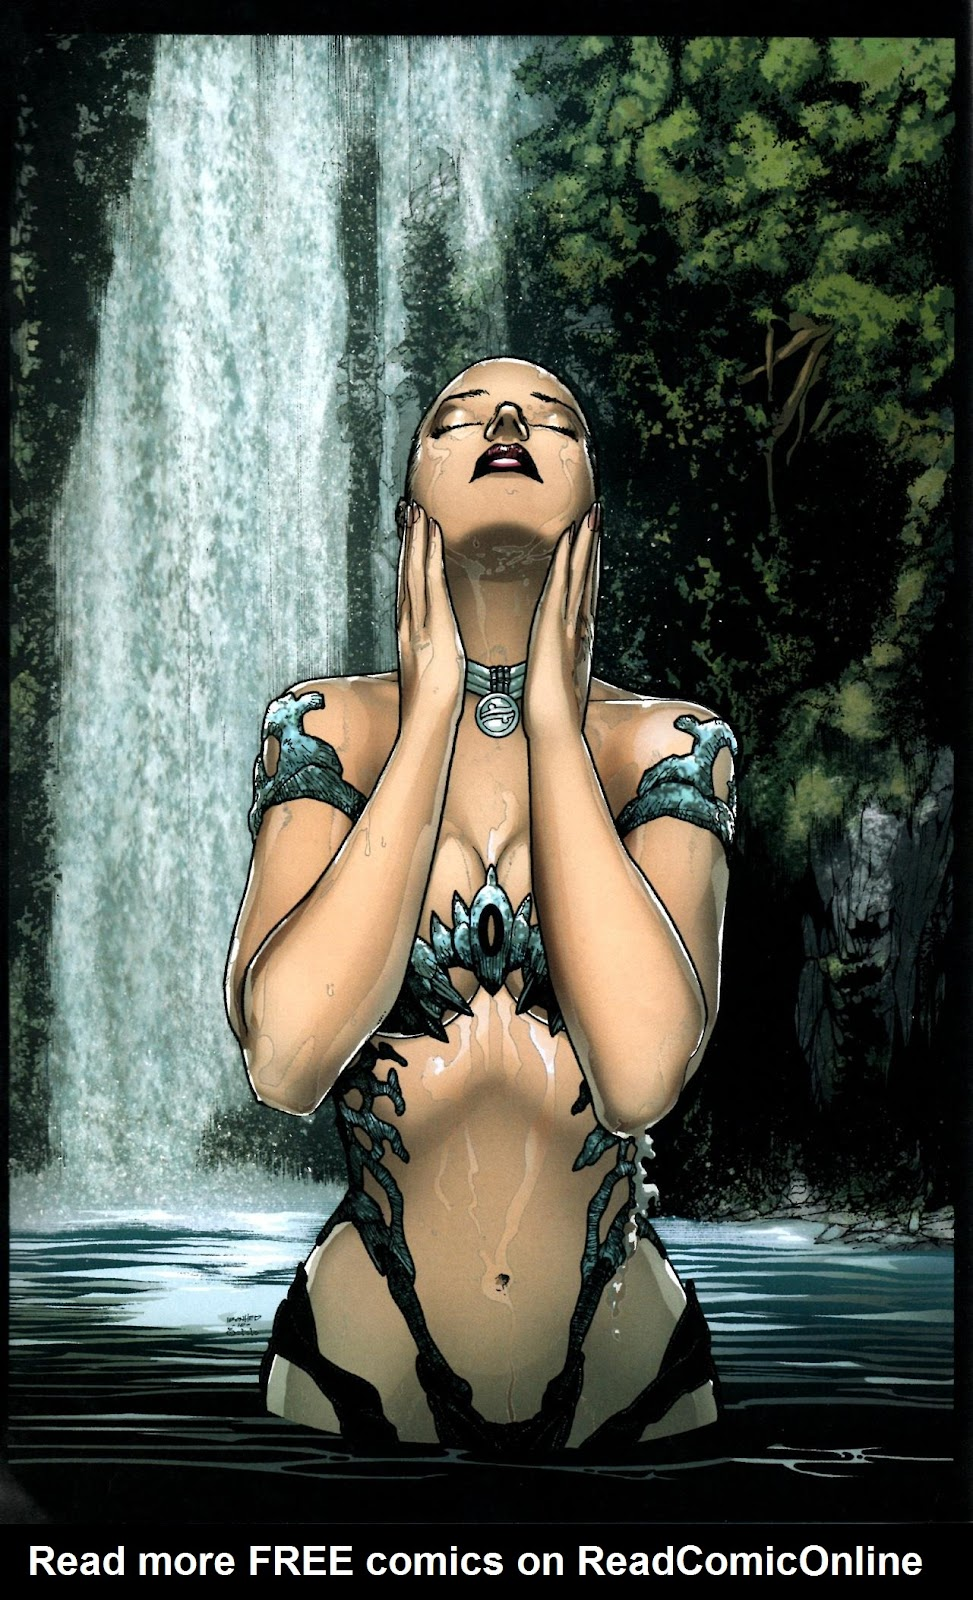 Read online Aspen Splash: Swimsuit Spectacular comic -  Issue # Issue 2010 - 3